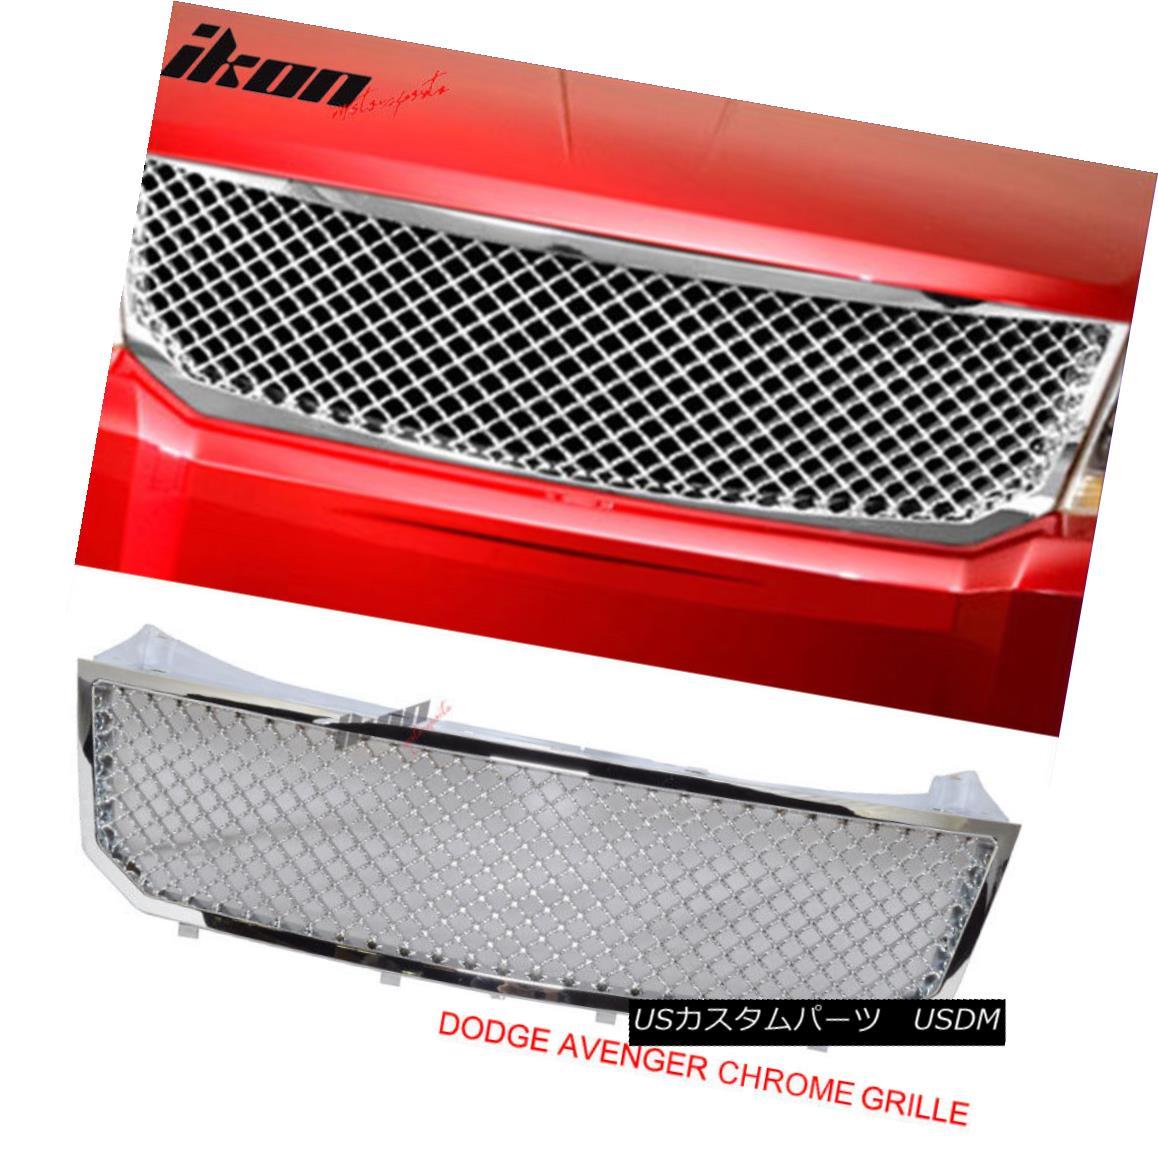 USグリル Fit 08-11 Avenger 09-10 Sebring Honeycomb Front Sport Mesh Grill Hood Grille ABS フィット08-11アベンジャー09-10セブリングハニカムフロントスポーツメッシュグリルフードグリルABS